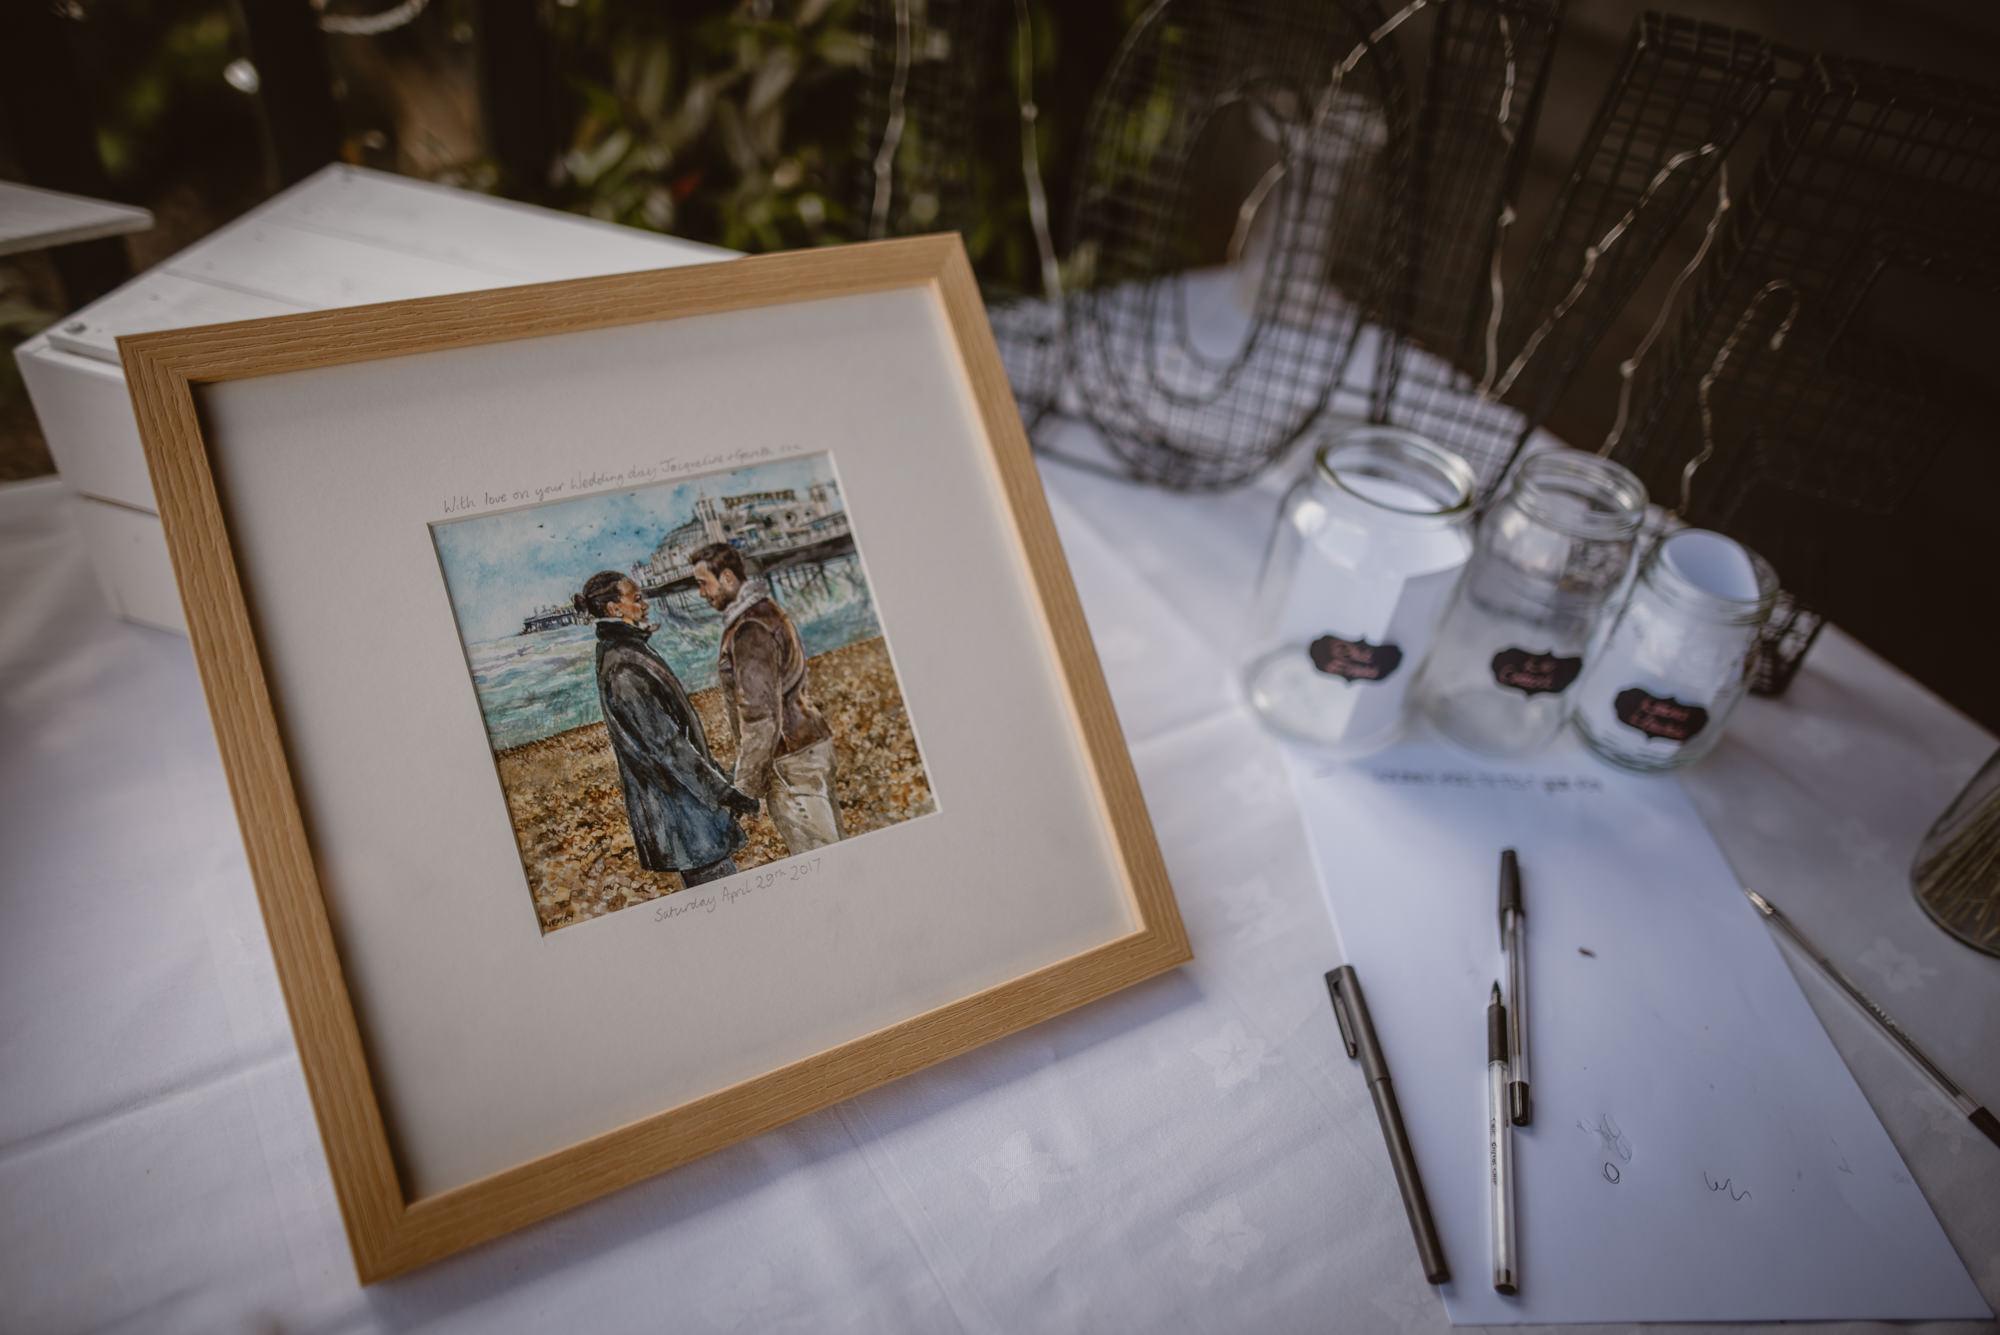 Jacqueline-Gareth-Wedding-Westmead-Events-Surrey-Manu-Mendoza-Wedding-Photography-475.jpg